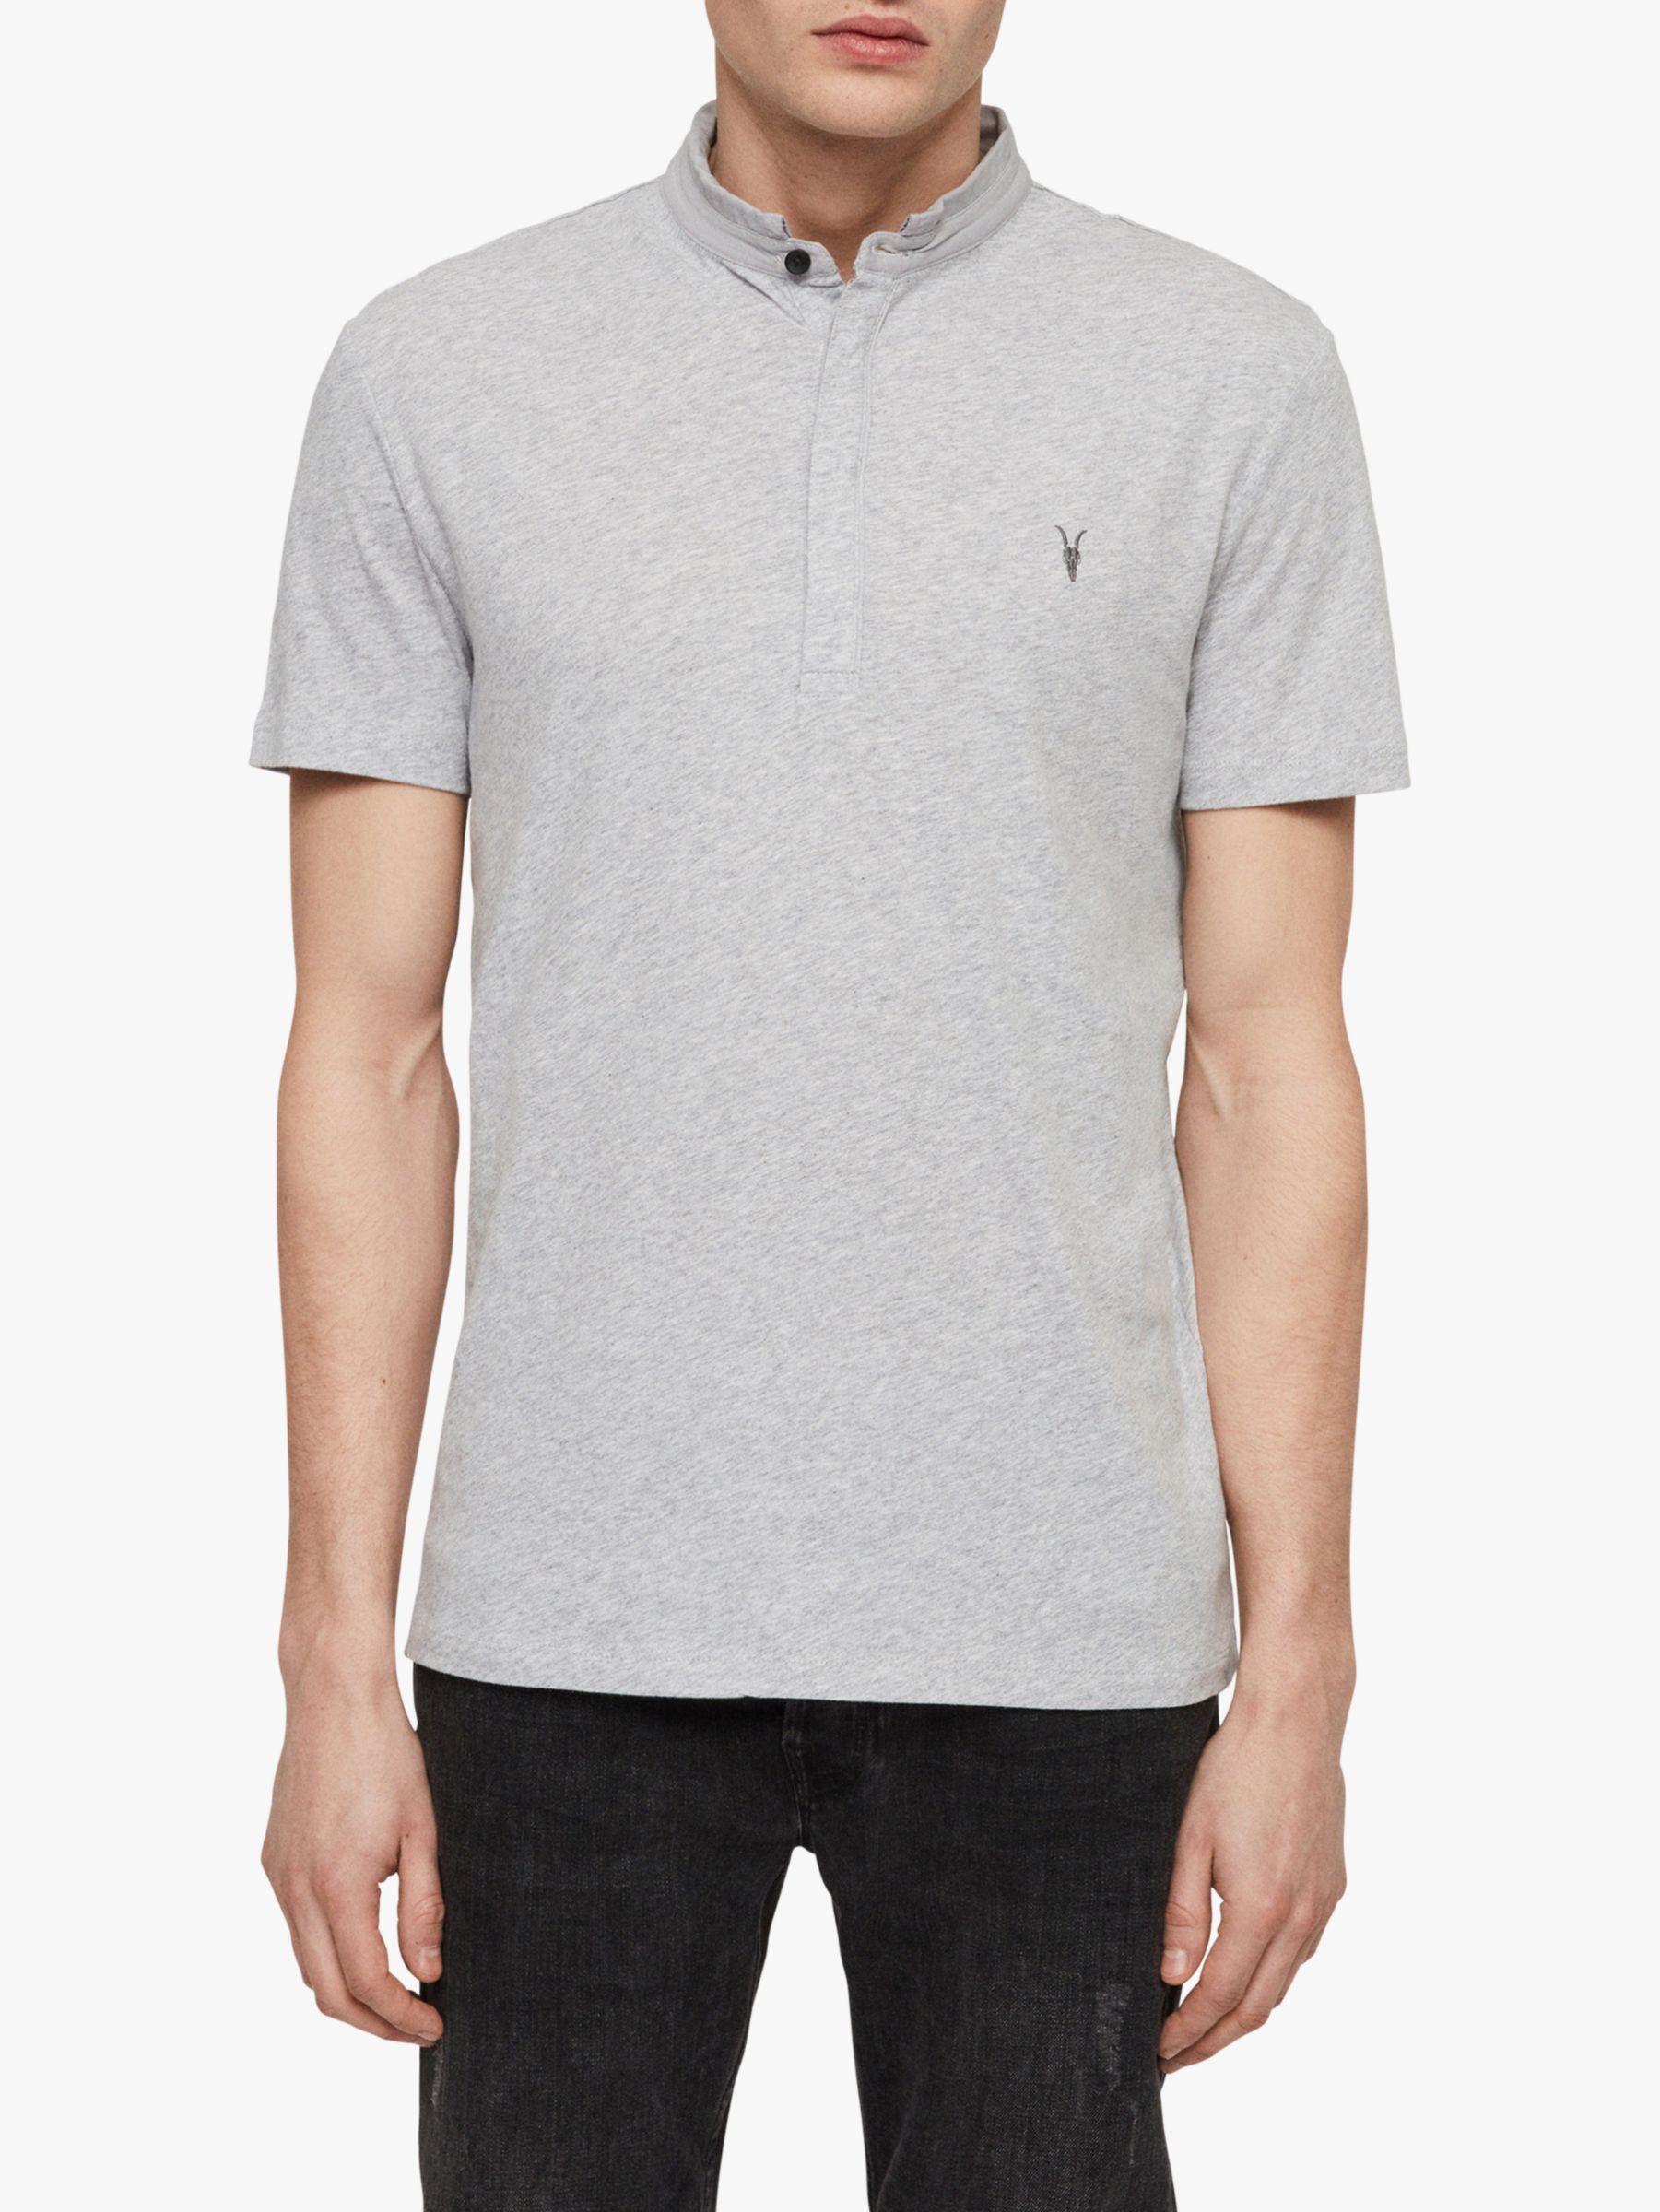 AllSaints AllSaints Grail Polo Shirt